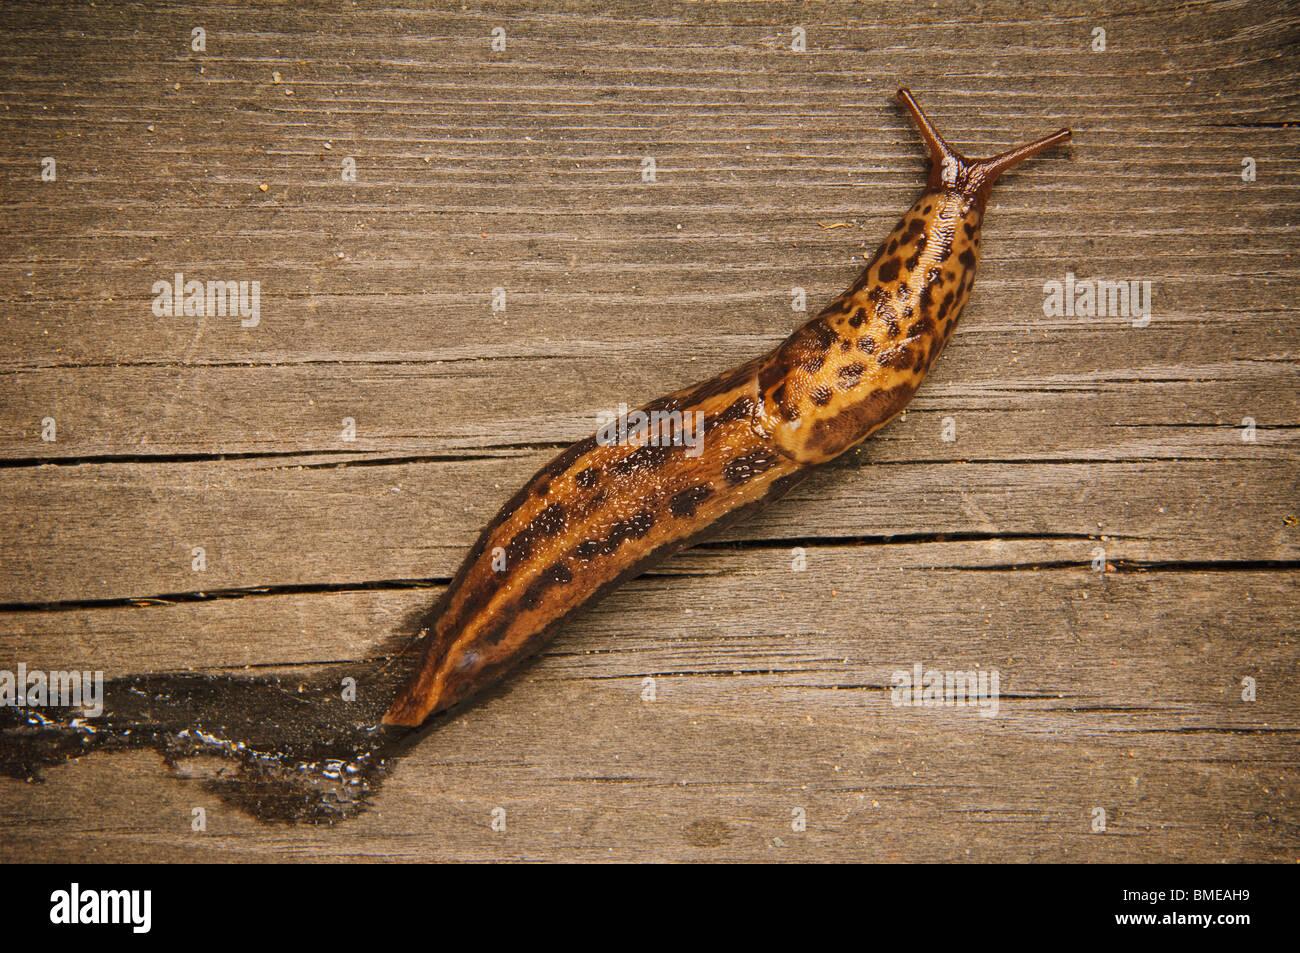 Snail on wood, Sweden. - Stock Image